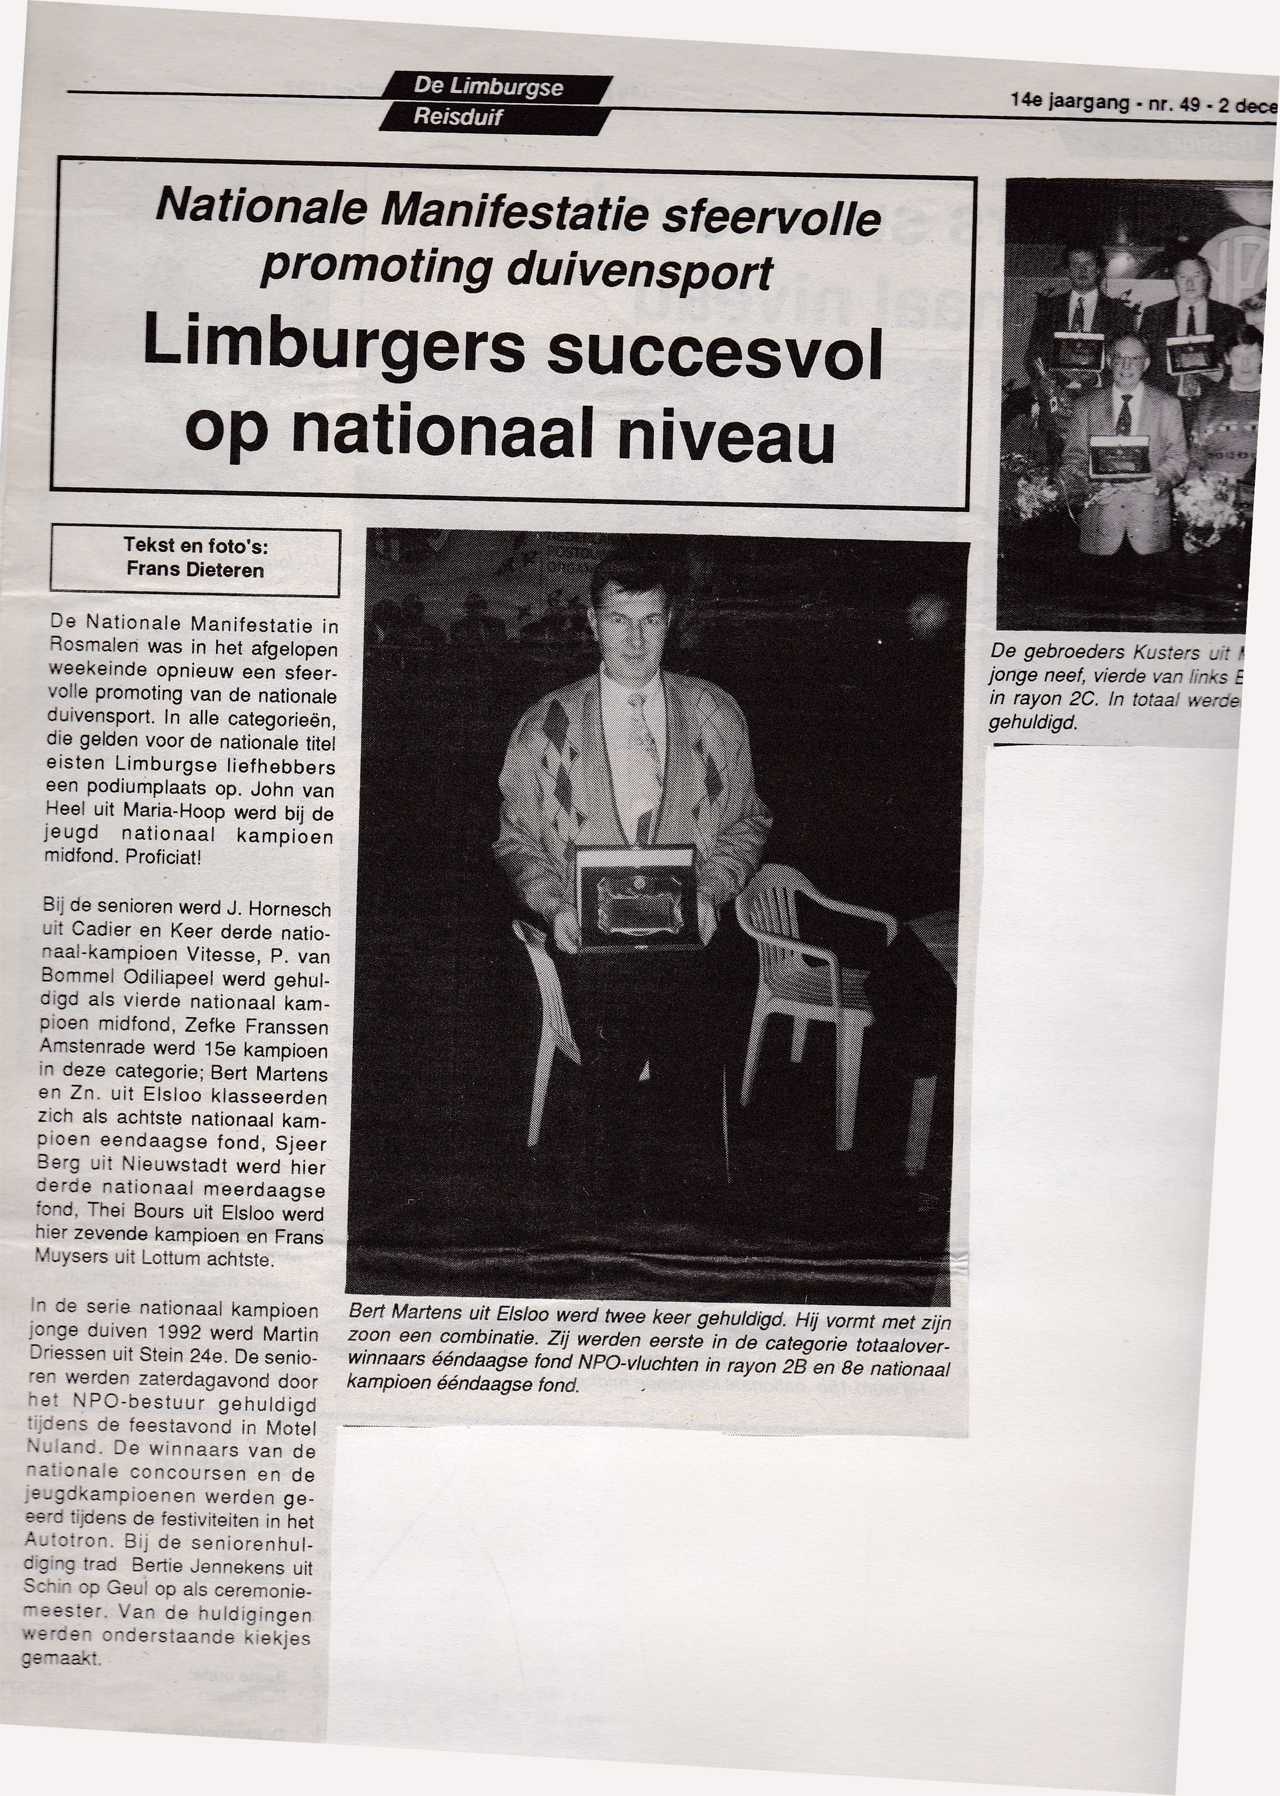 1992 - De Limburgse Reisduif